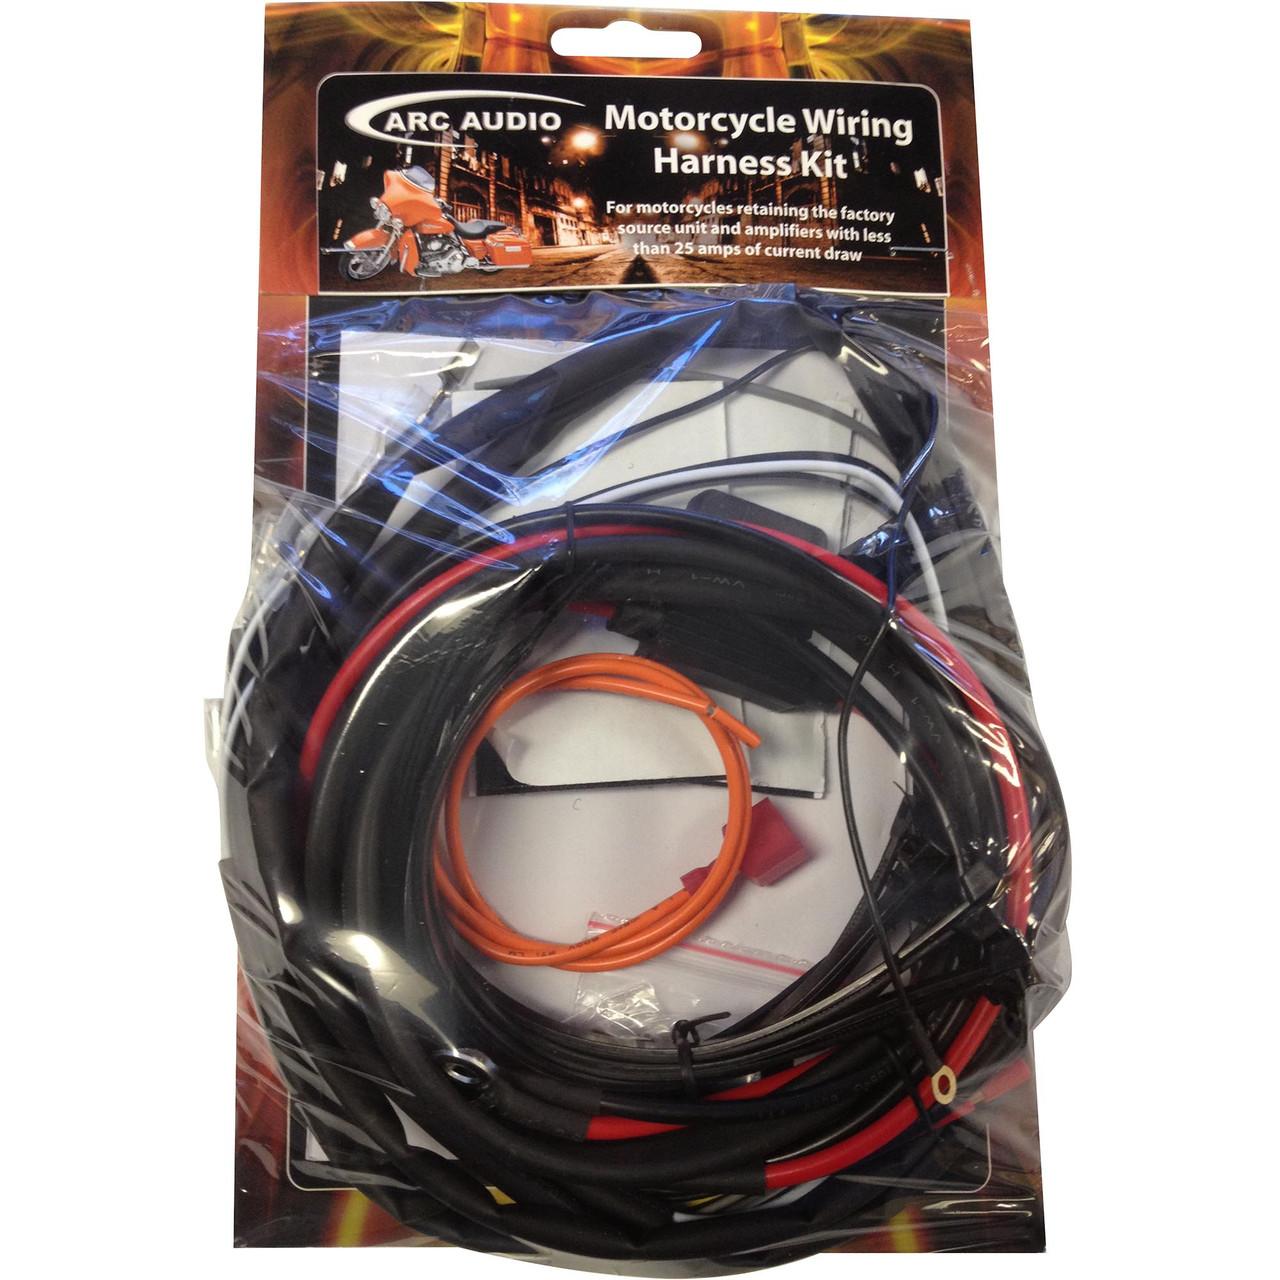 Arc Wiring Harness Everything About Diagram Hdmi Audio Hd Creative Rh Creativeaudio Net